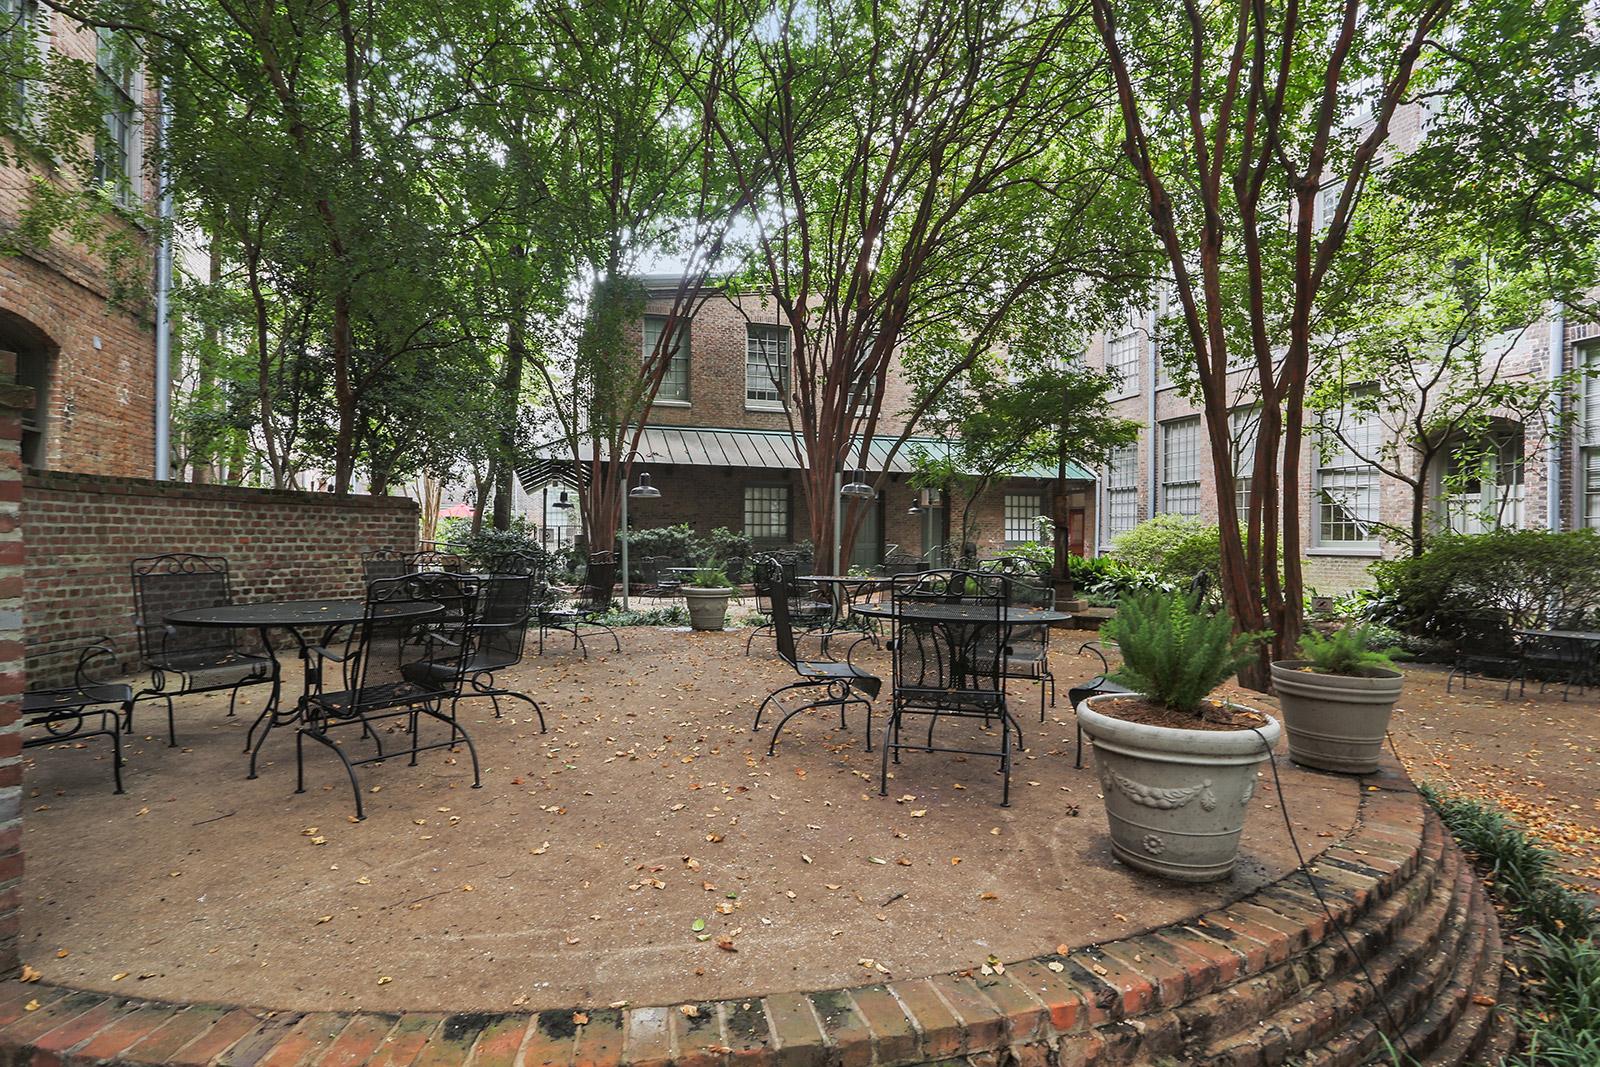 CBD/Warehouse District/South Market, Condo, 1 beds, 1.0 baths, $2400 per month New Orleans Rental - devie image_7